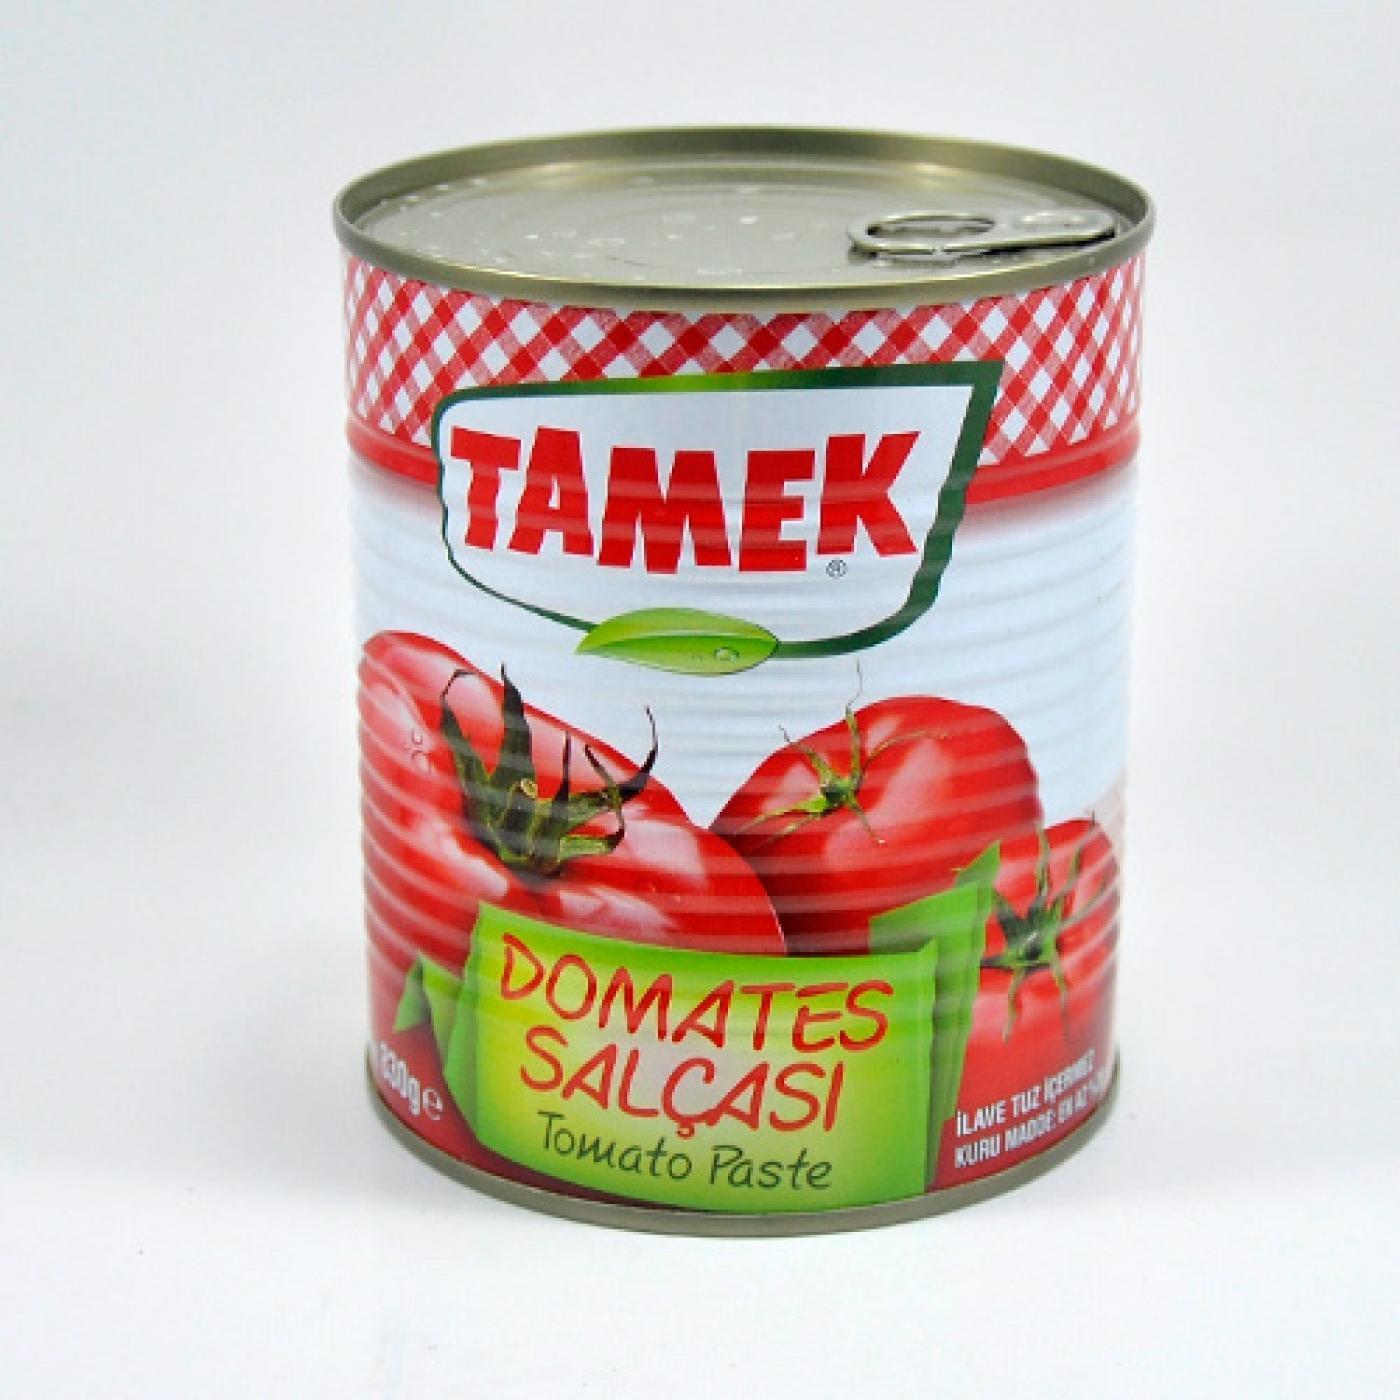 TAMEK DOMATES SALÇASI TNK 830GR